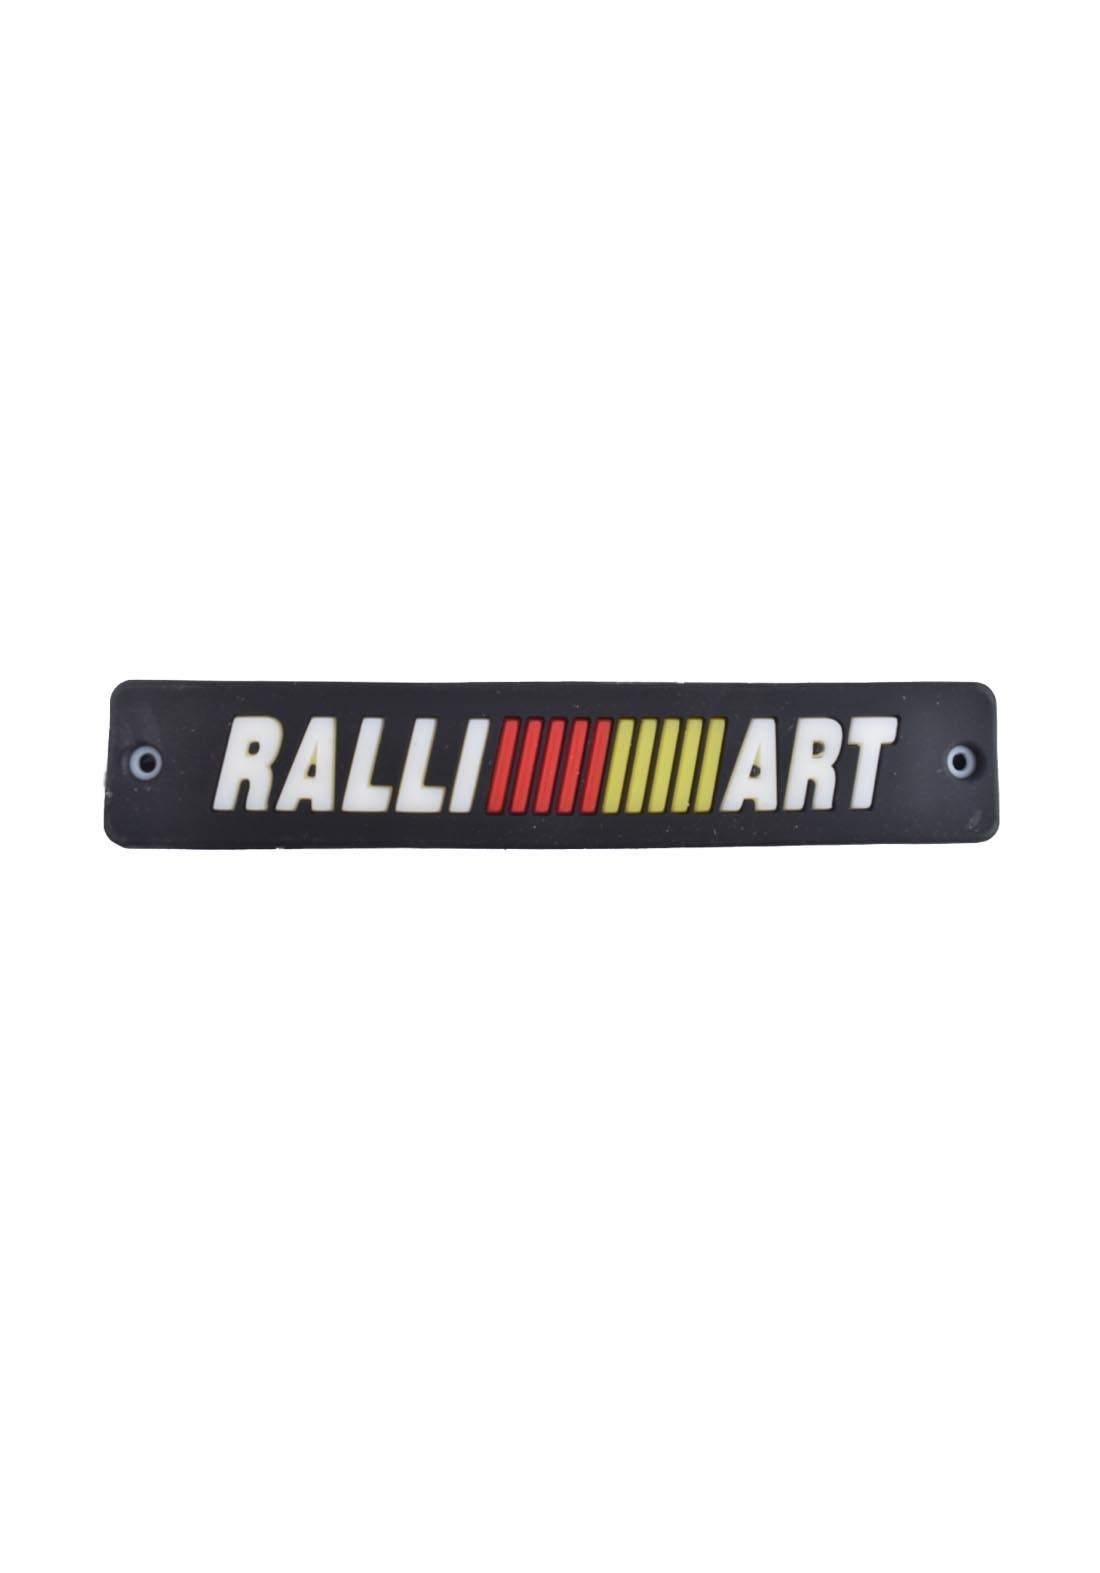 Led Daytime Running Lights -RALLI علامة ضوئية للسيارة